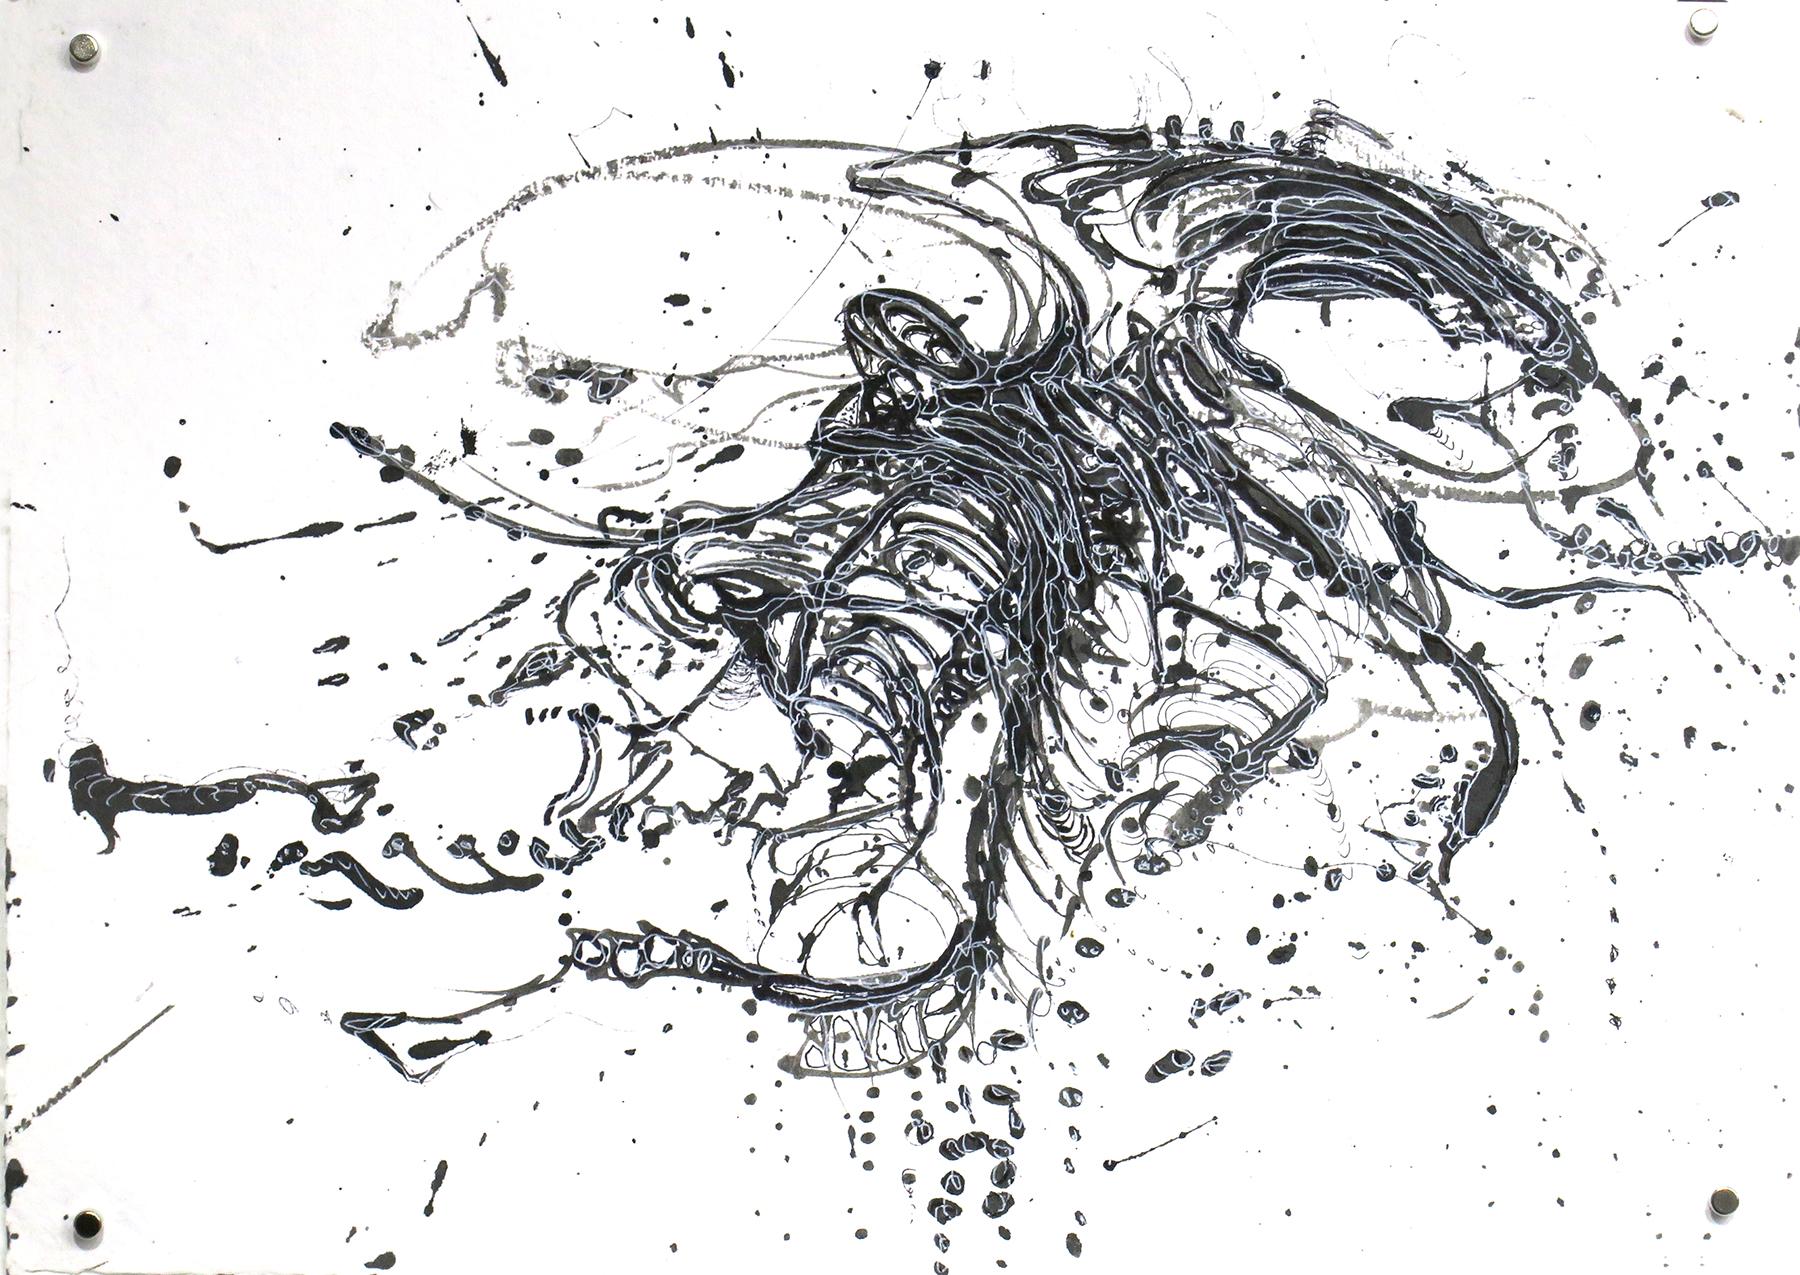 Kathryn Hart, Daunting Transitions, Krakow Ink Drawing 1